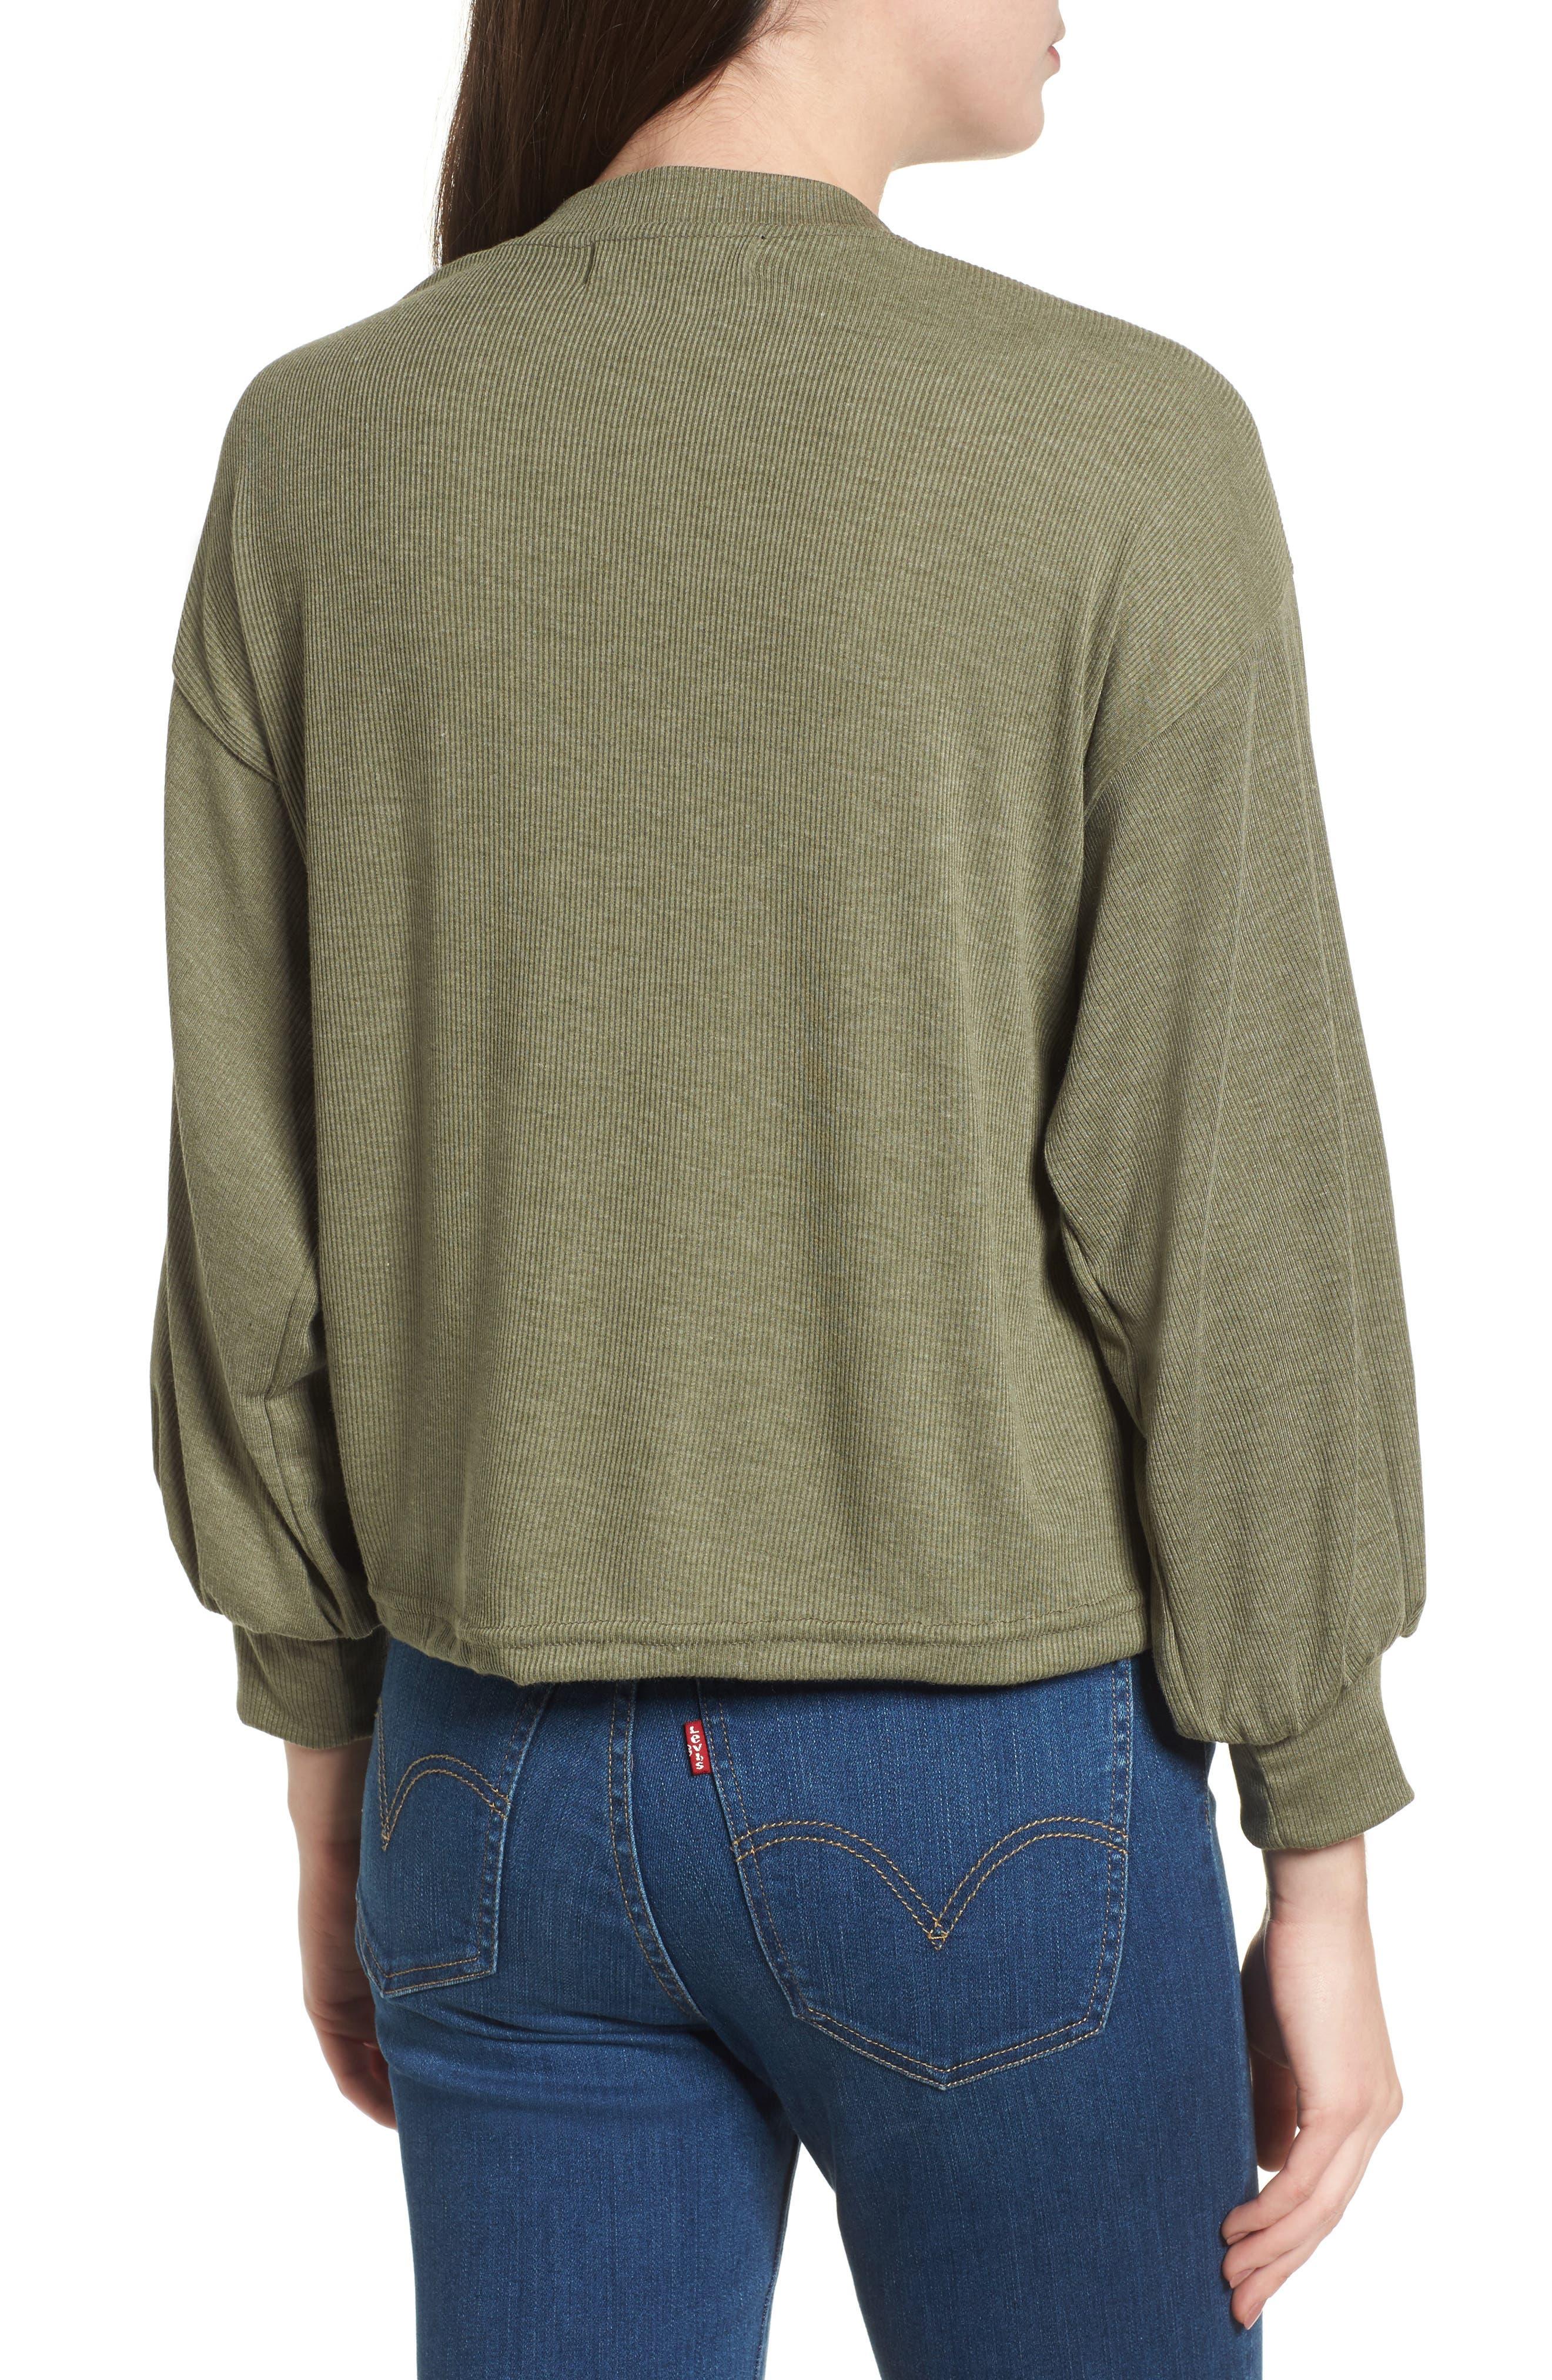 Balloon Sleeve Sweater,                             Alternate thumbnail 2, color,                             341